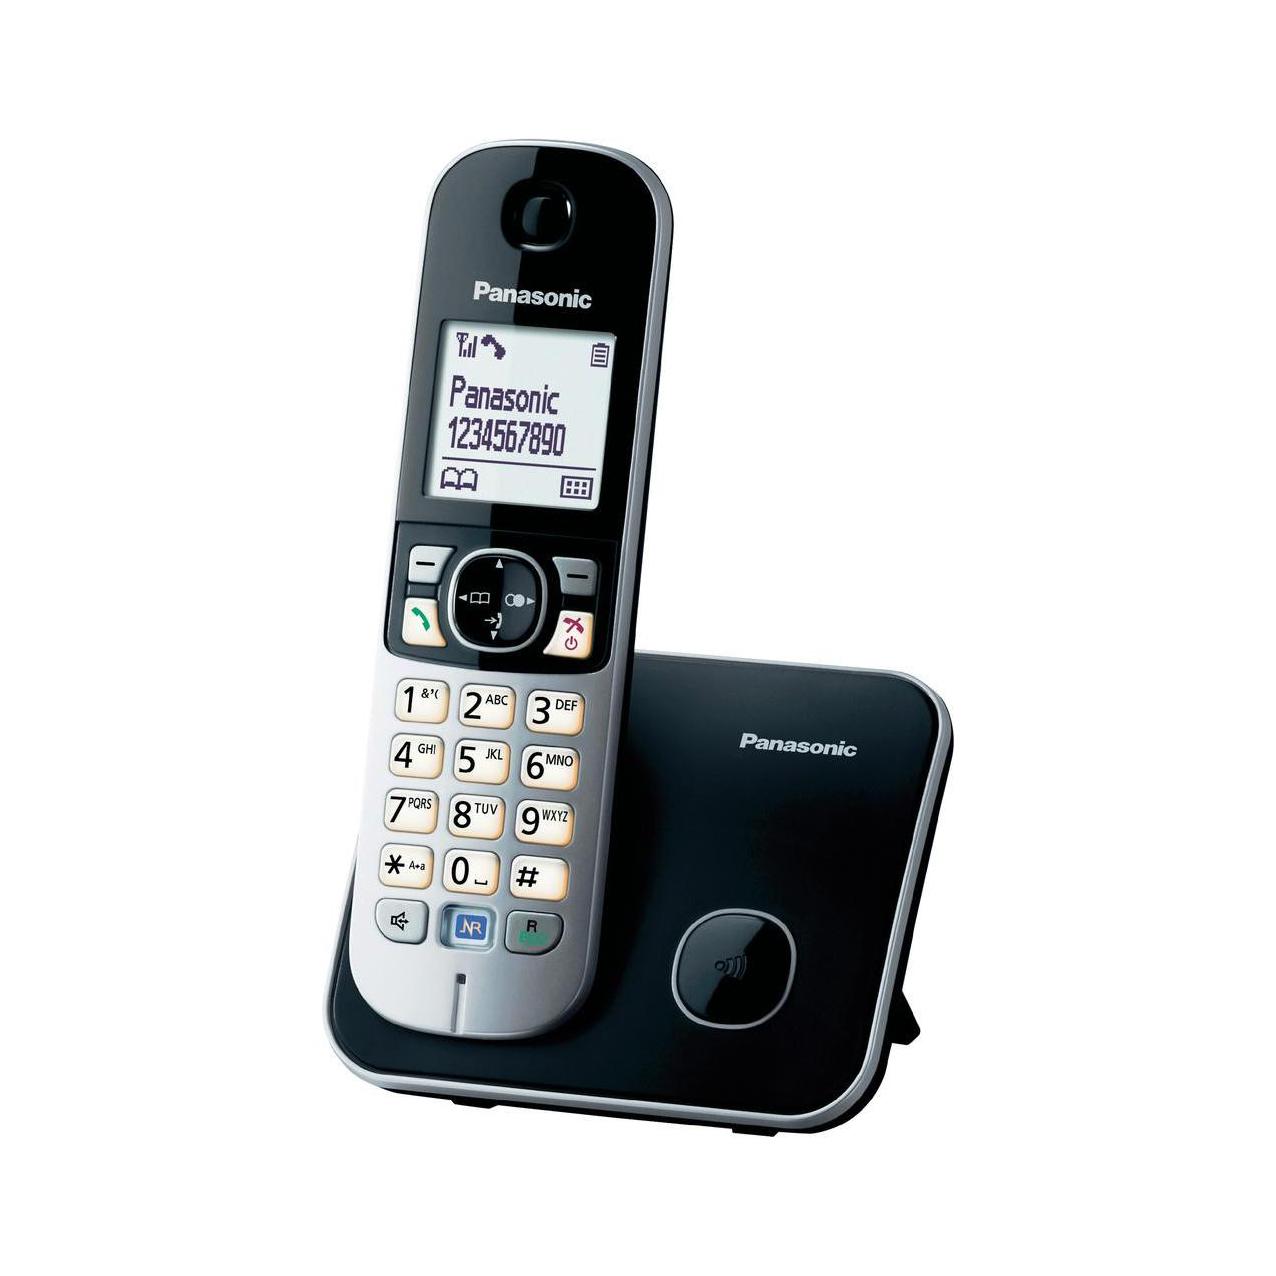 تلفن بیسیم پاناسونیک مدل Panasonic-KX-TG6811